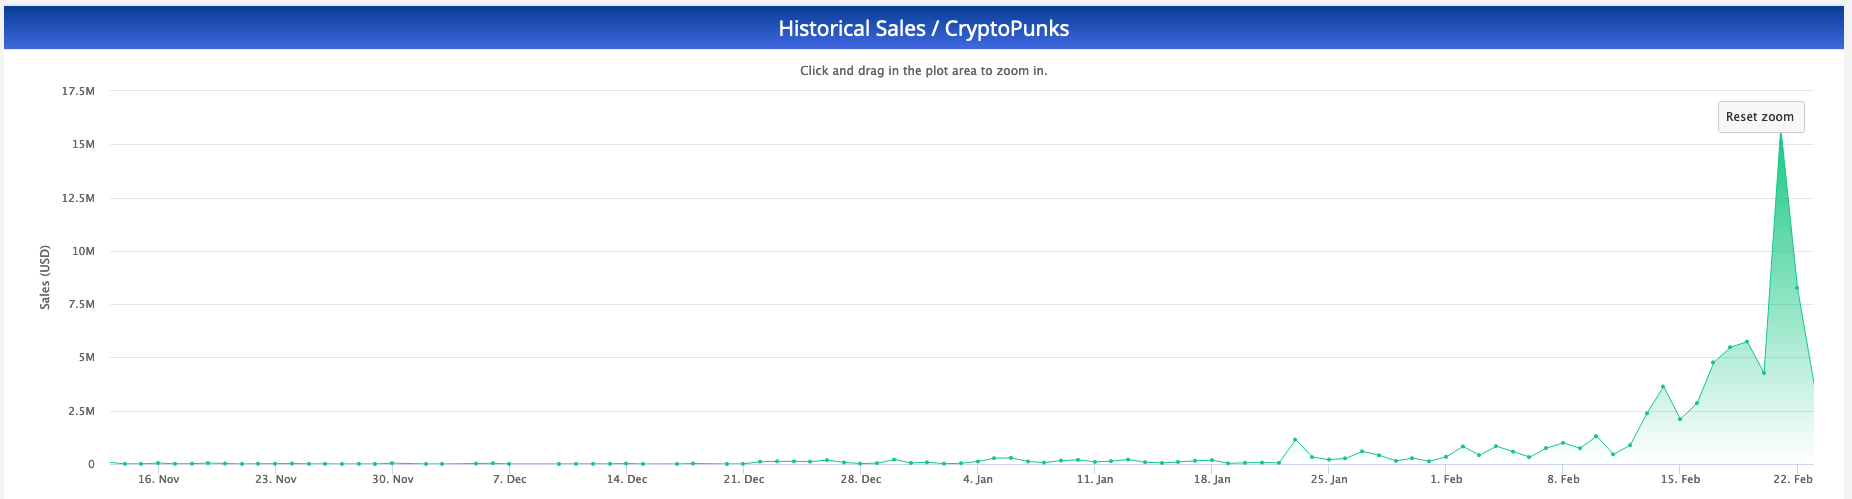 CryptoPunks sales shot up